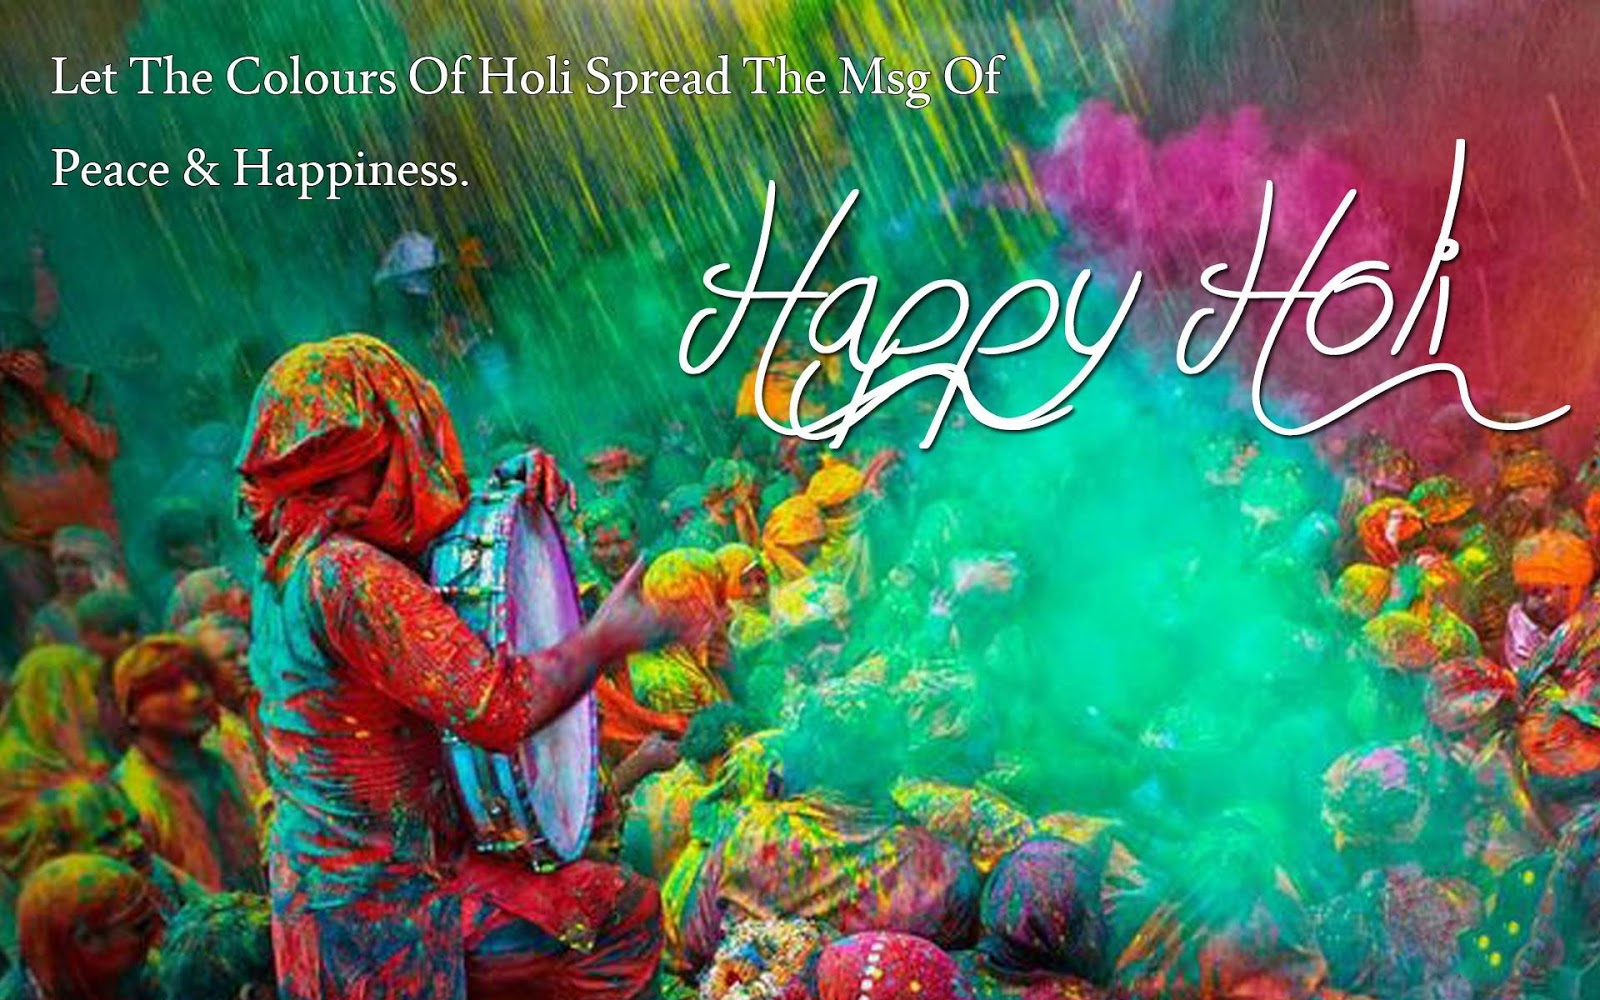 Happy holi poems in Tamil Telugu Language|Happy holi poems in Malayalam Kannada Script